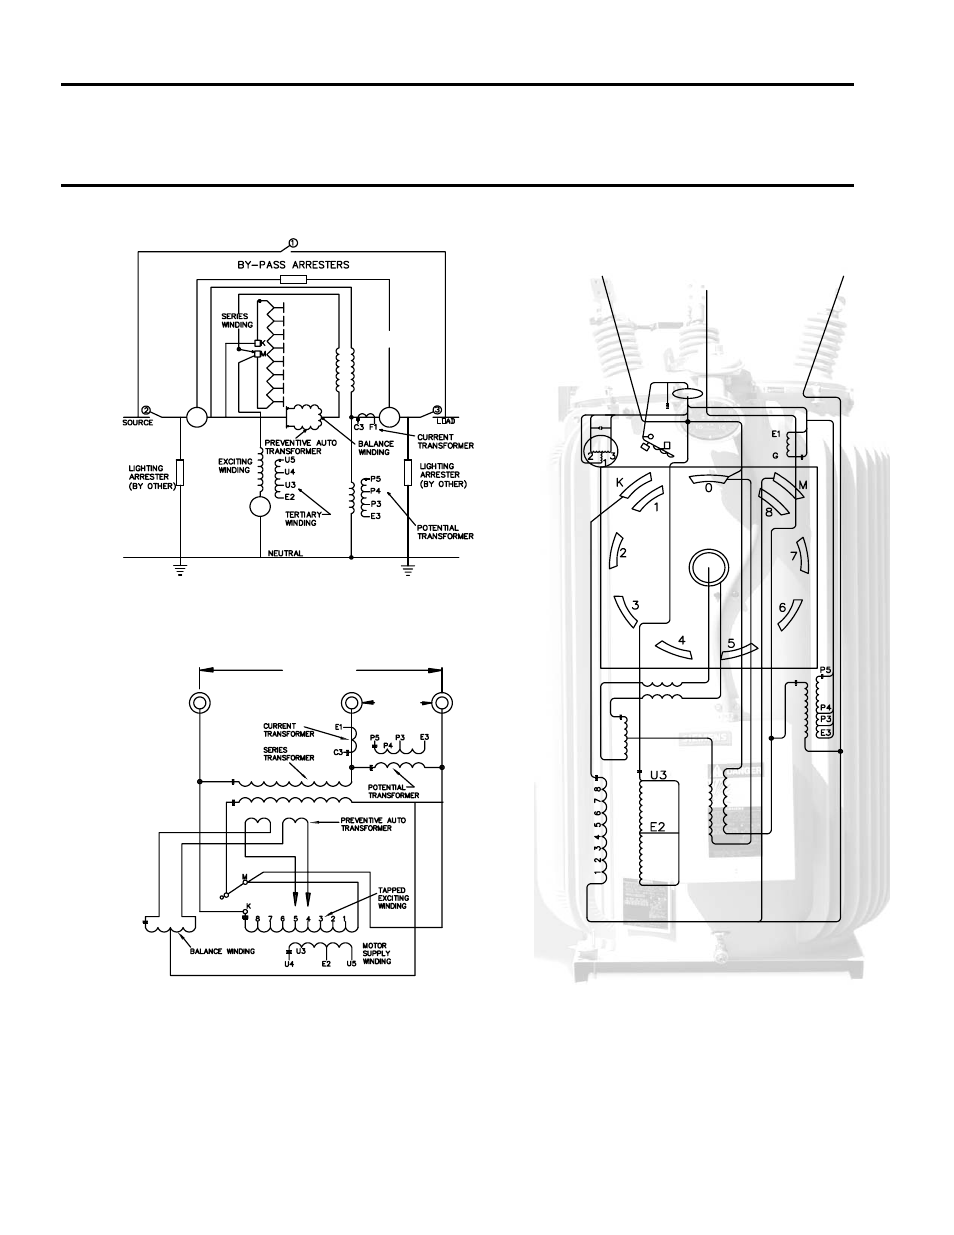 hight resolution of connection diagrams series transformer design siemens jfr distribution step voltage regulator 21 115532 001 user manual page 12 28